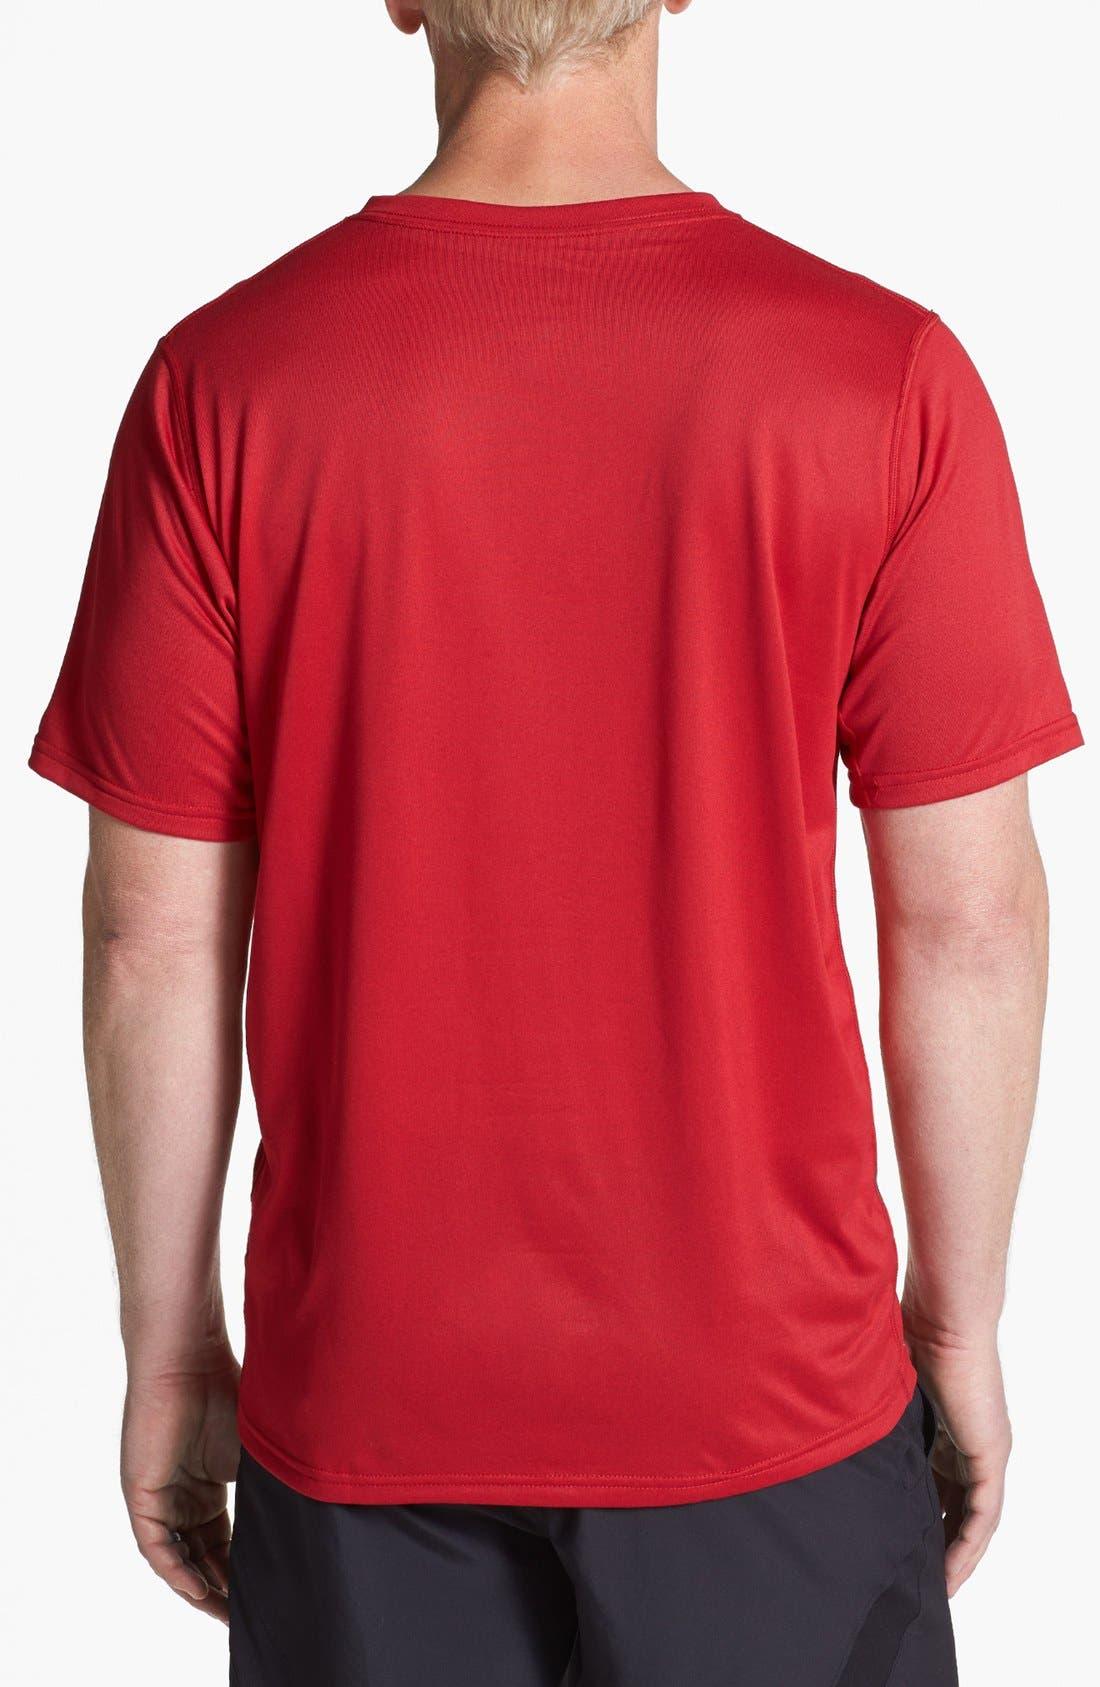 Alternate Image 2  - Nike 'Legend' Dri-FIT V-Neck T-Shirt